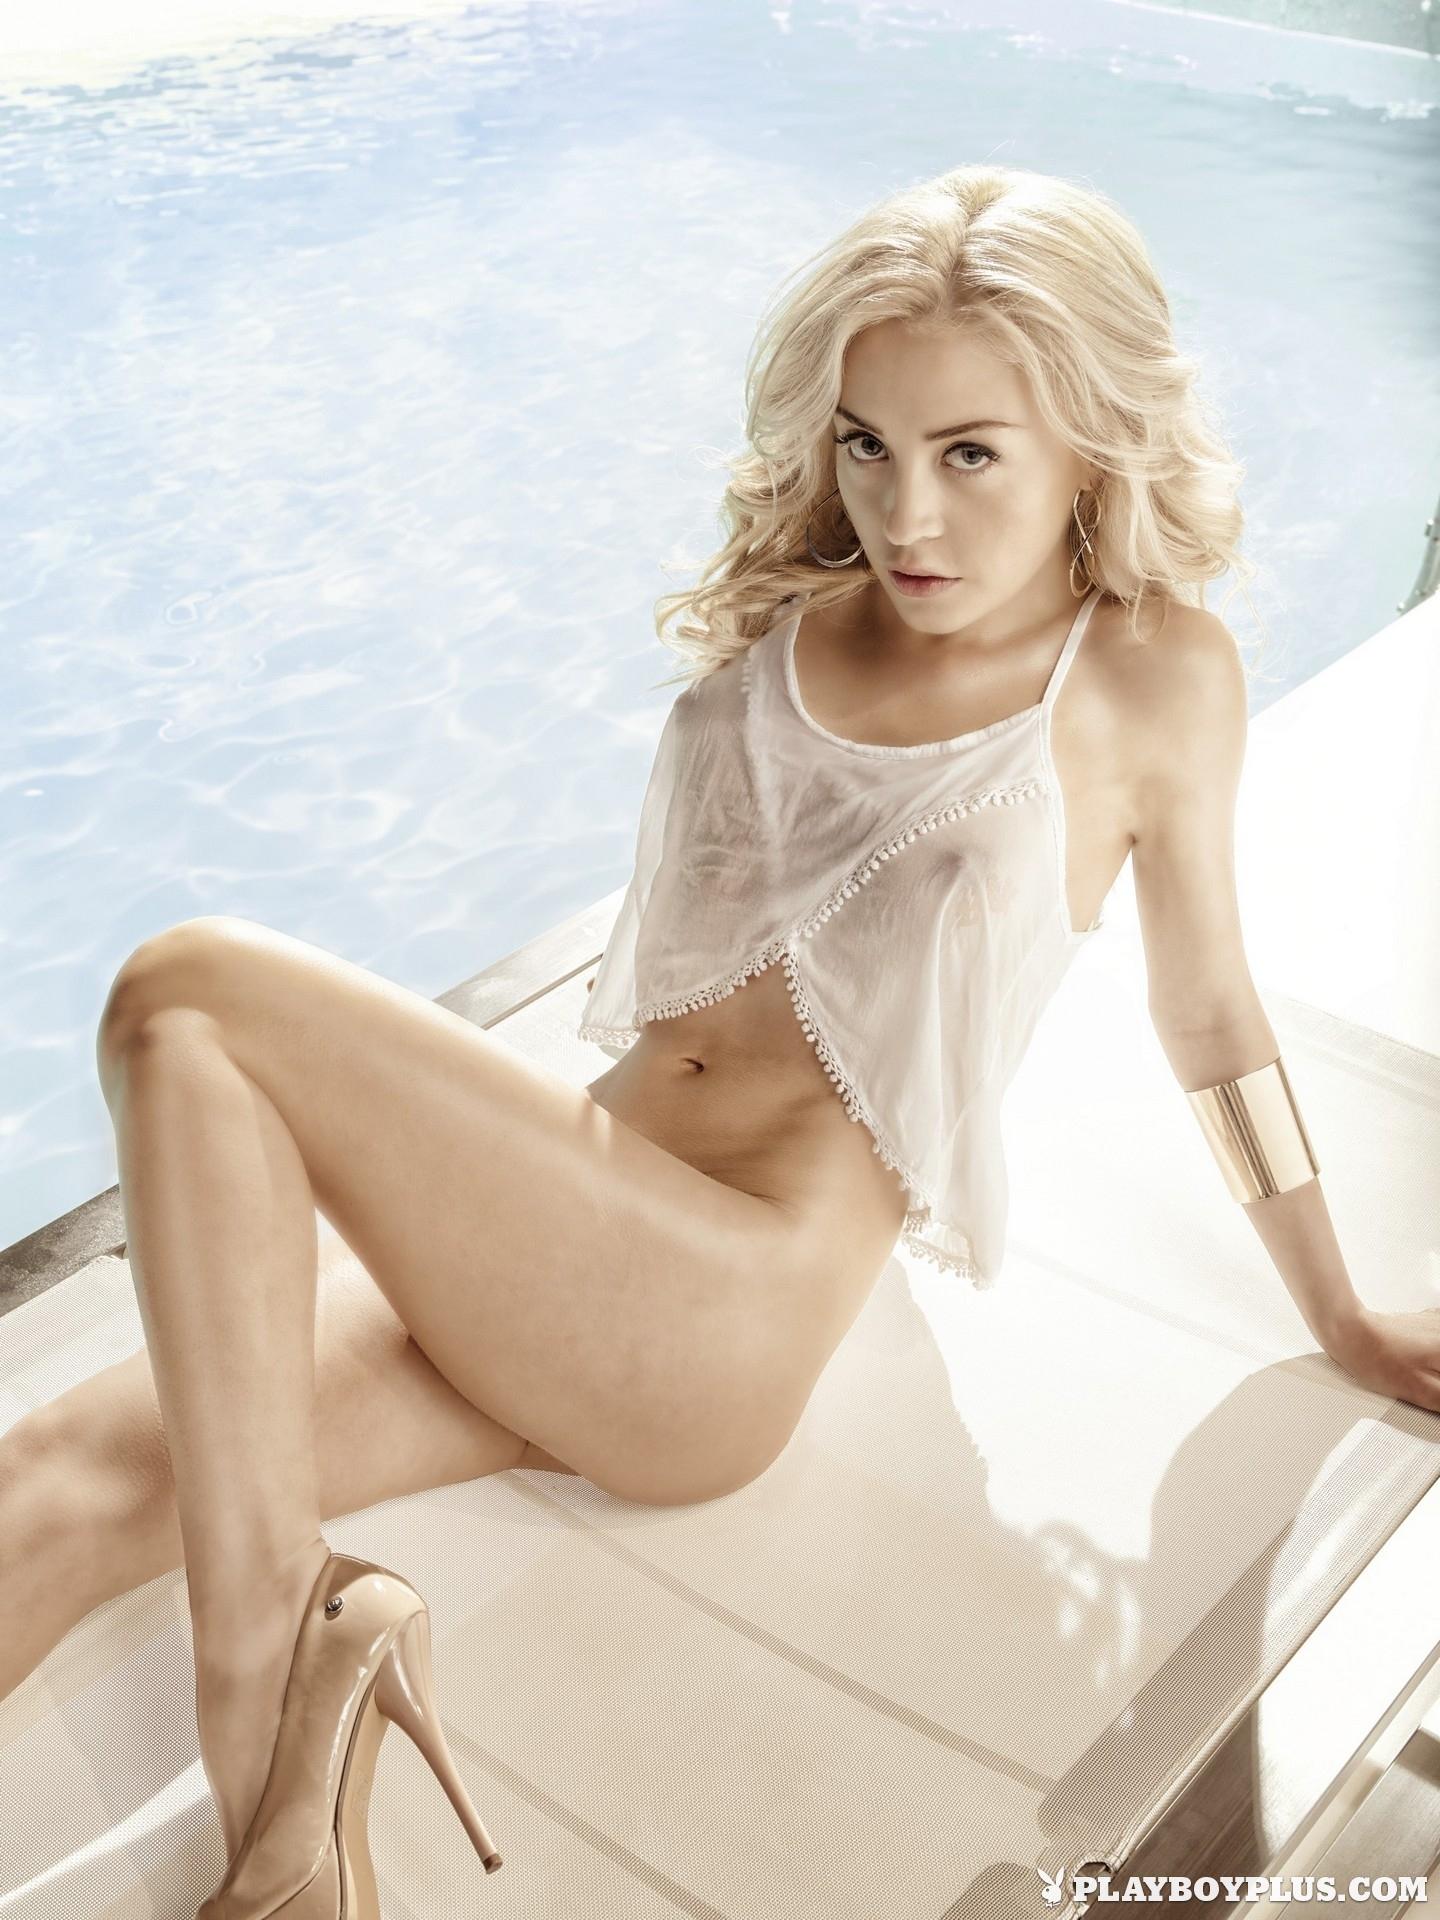 amber-bassick-blonde-nude-underwater-playboy-02